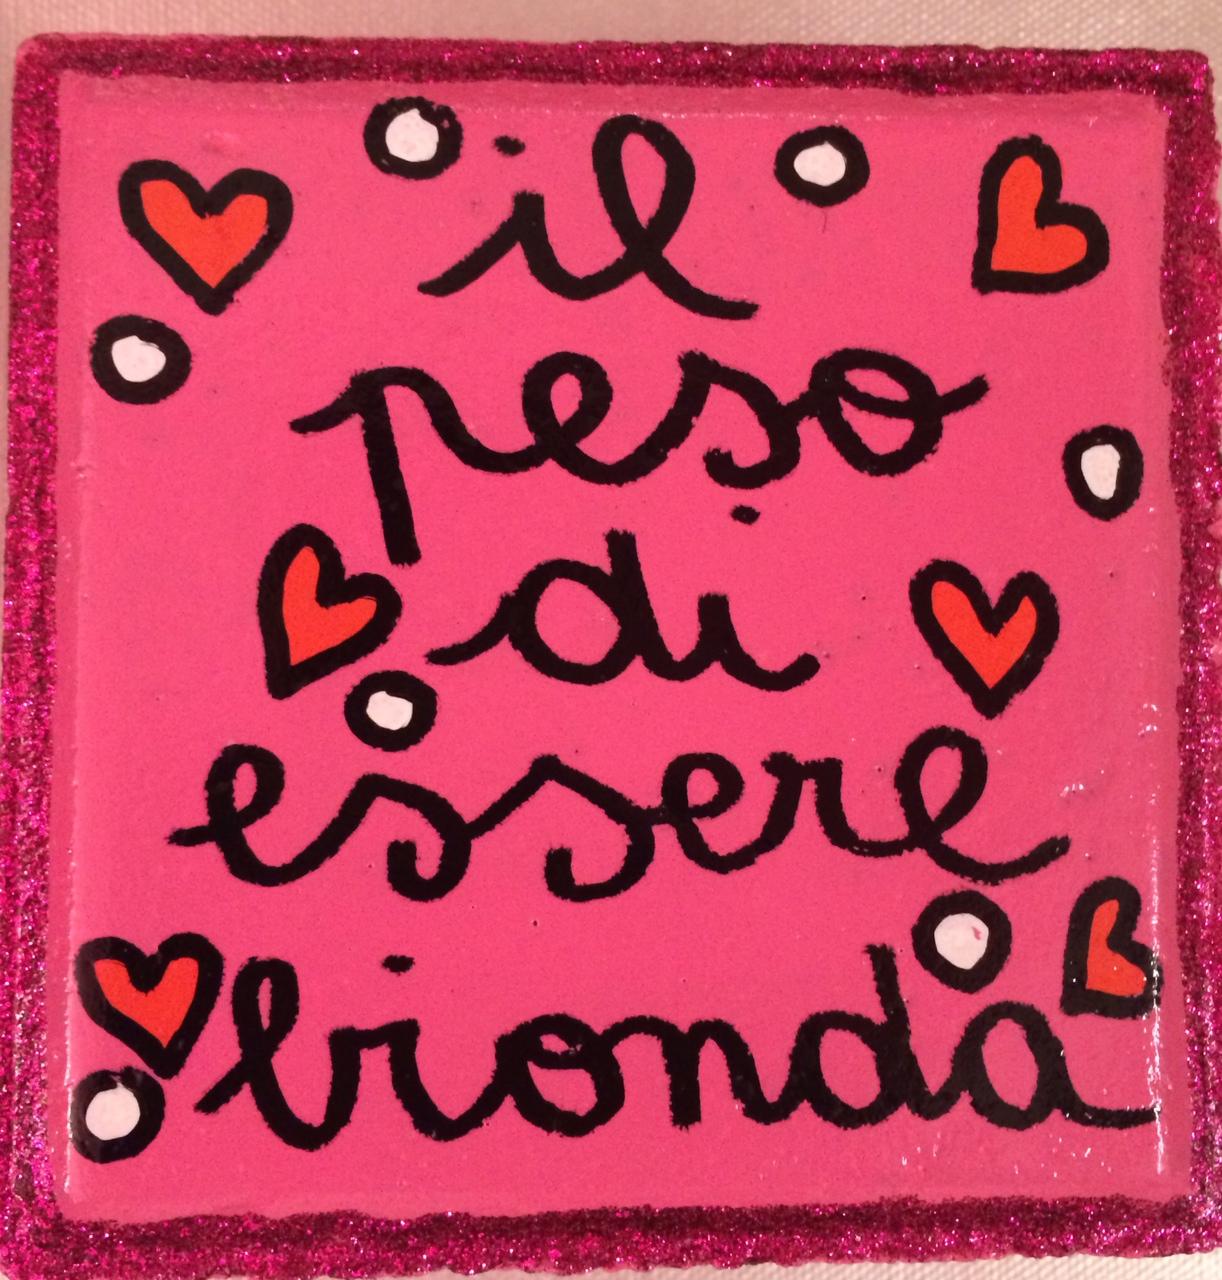 Love-Message-Silvia-Tosi